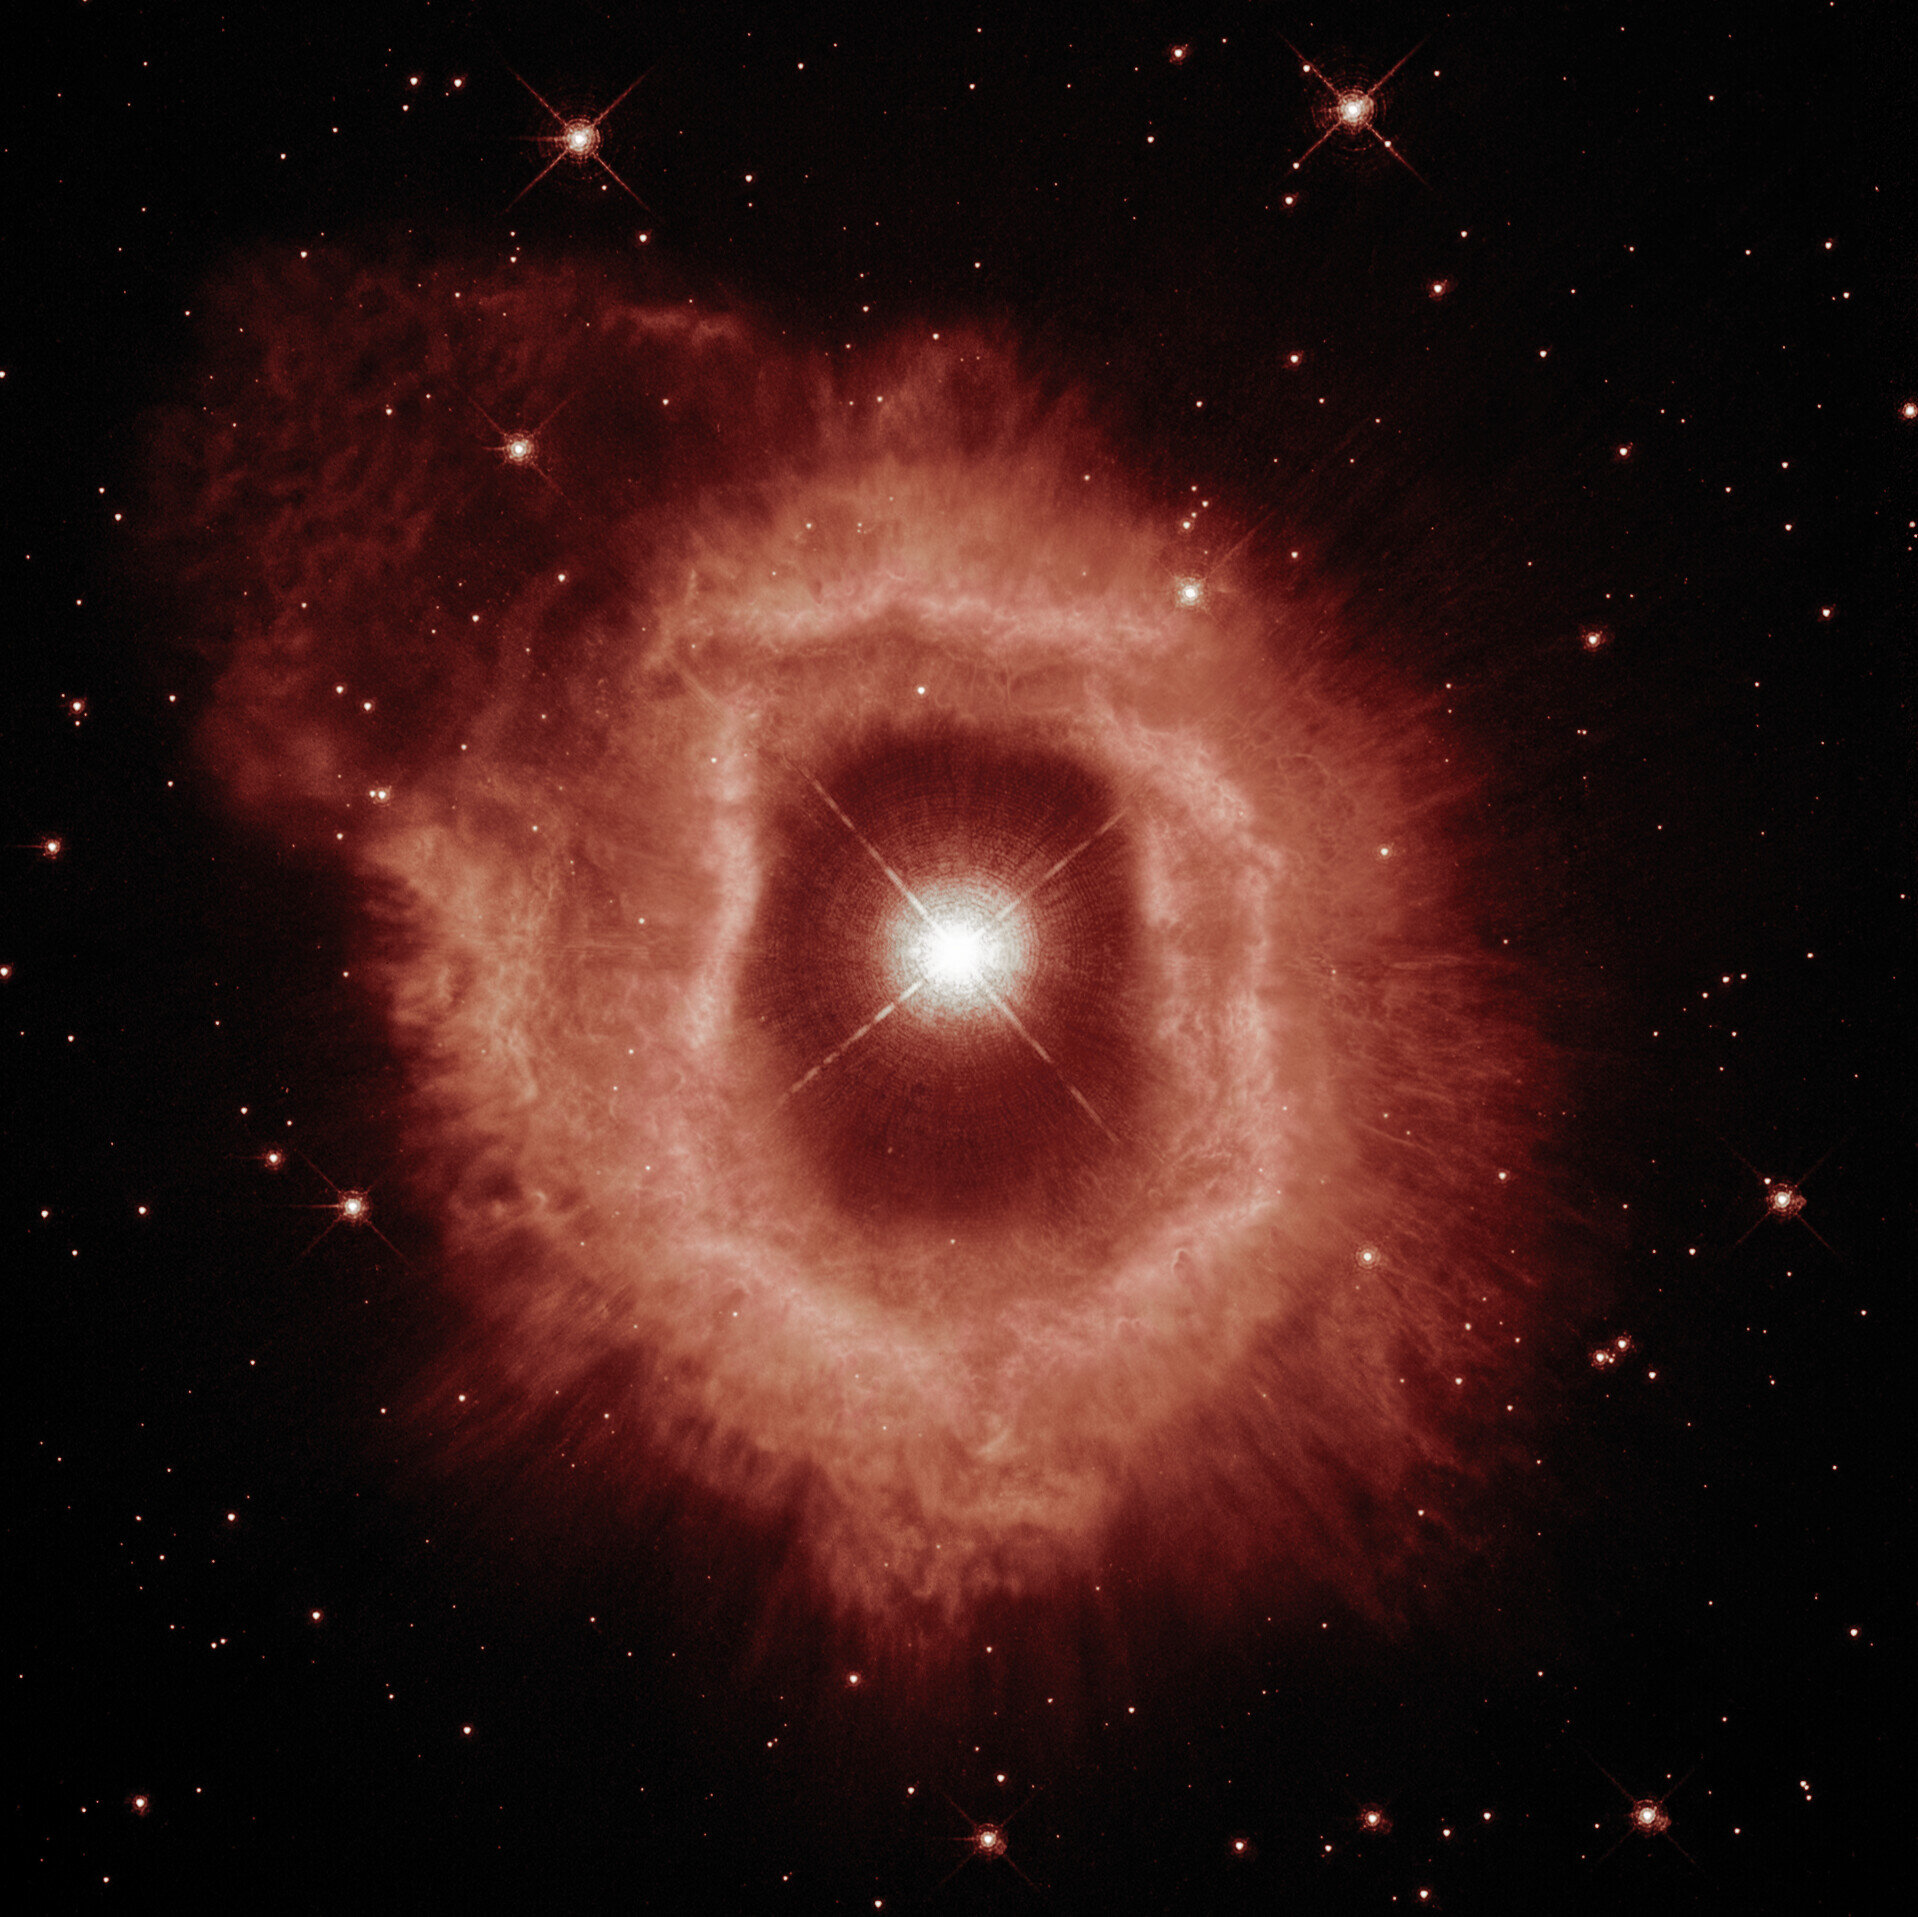 Izvor: ESA/Hubble and NASA, A. Nota, C. Britt.